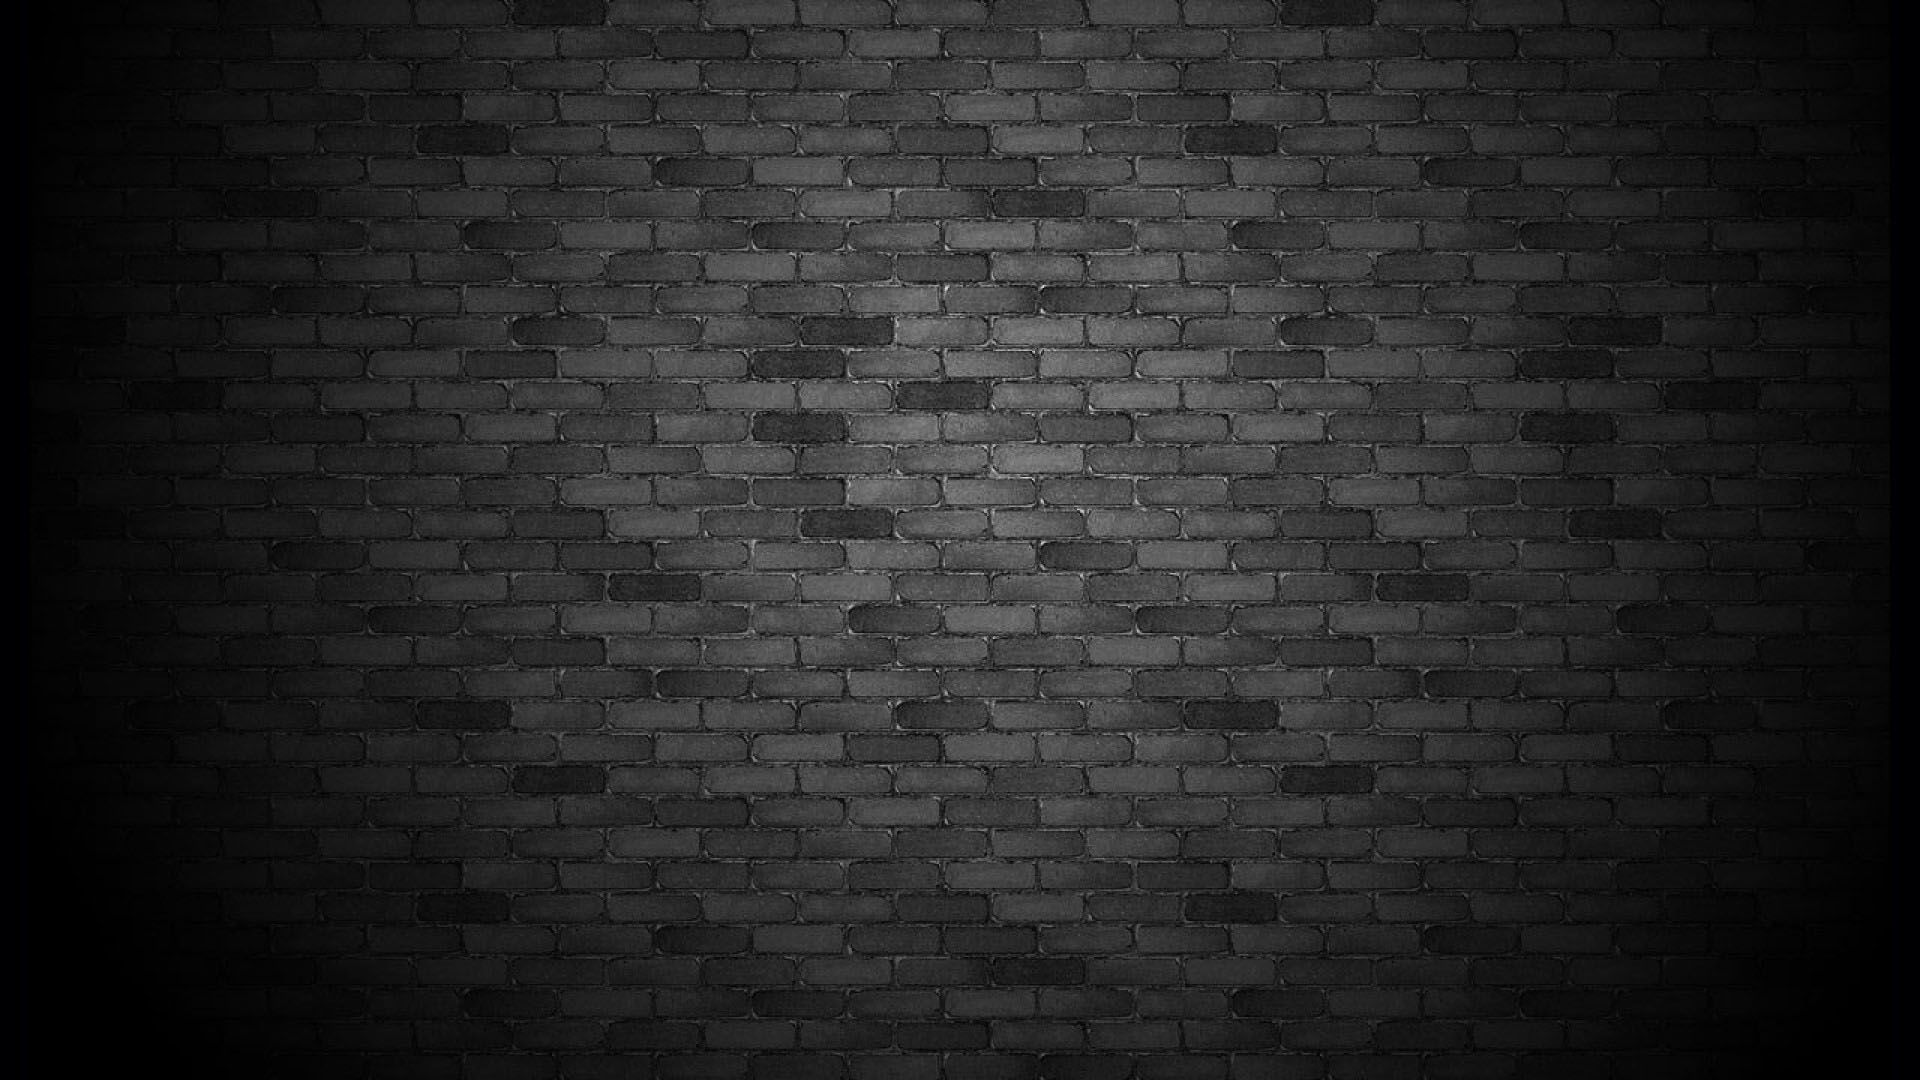 Black walls in